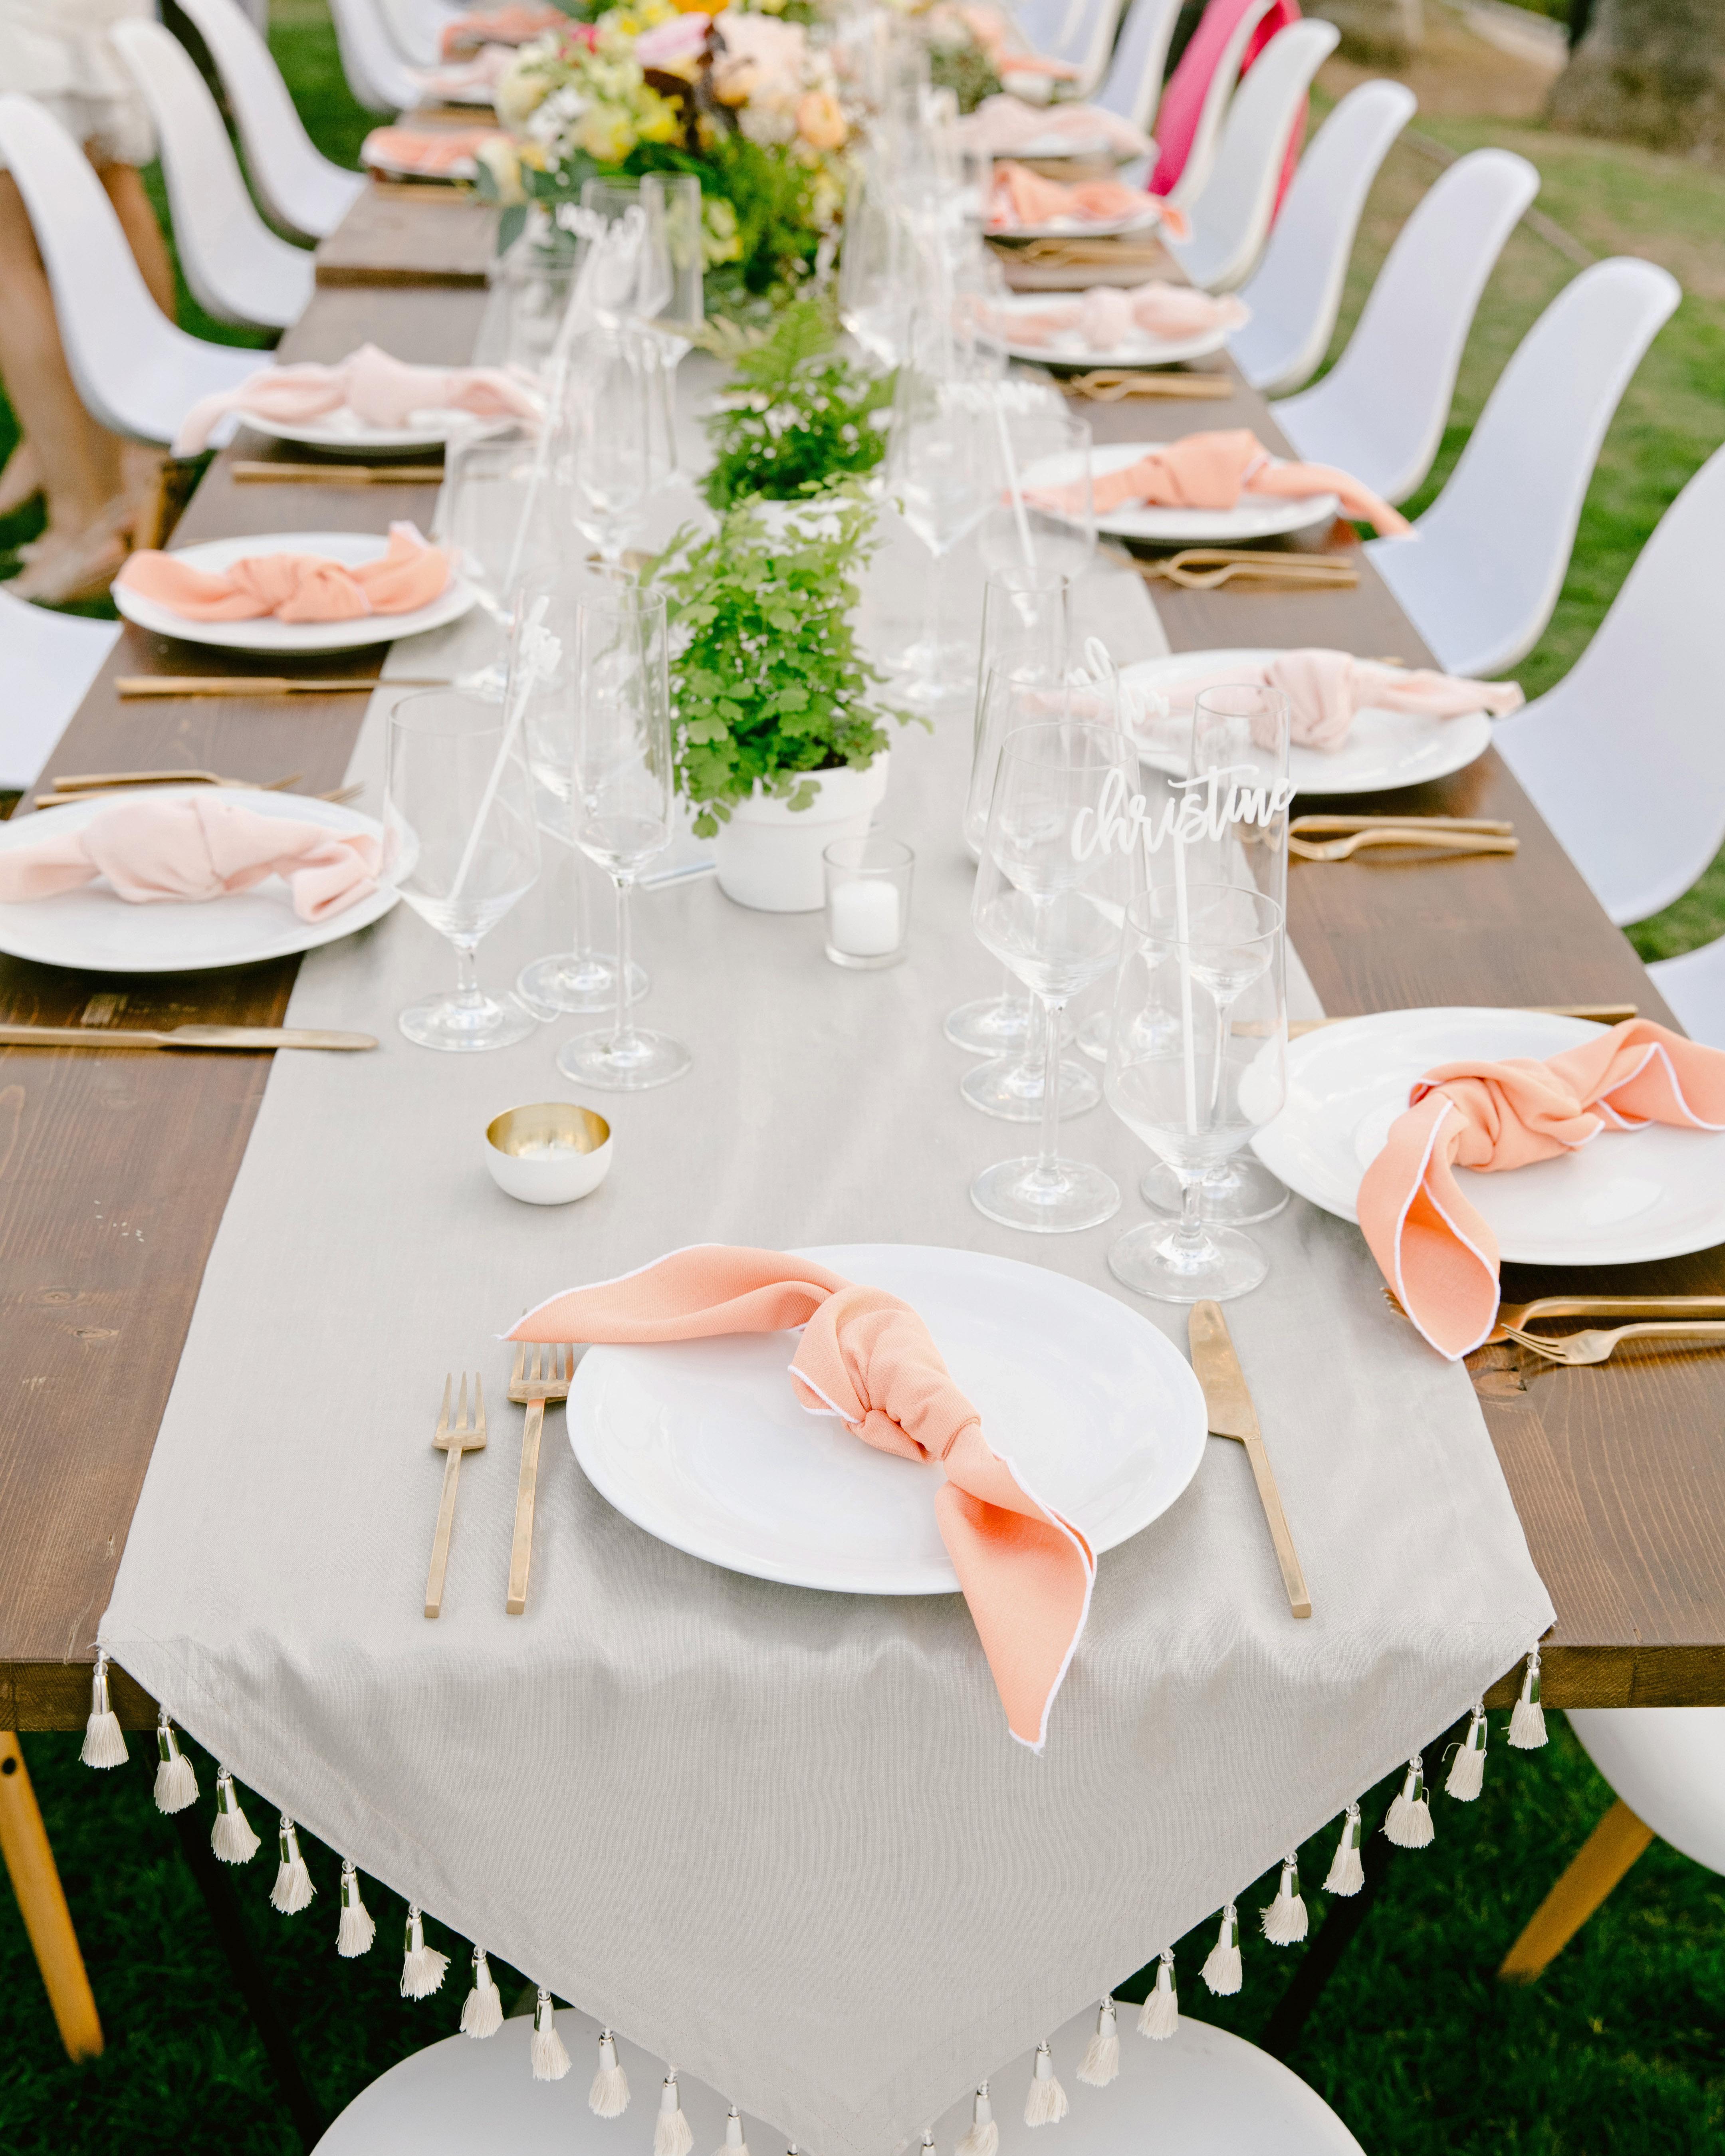 peach blush serviettes tasseled table runner